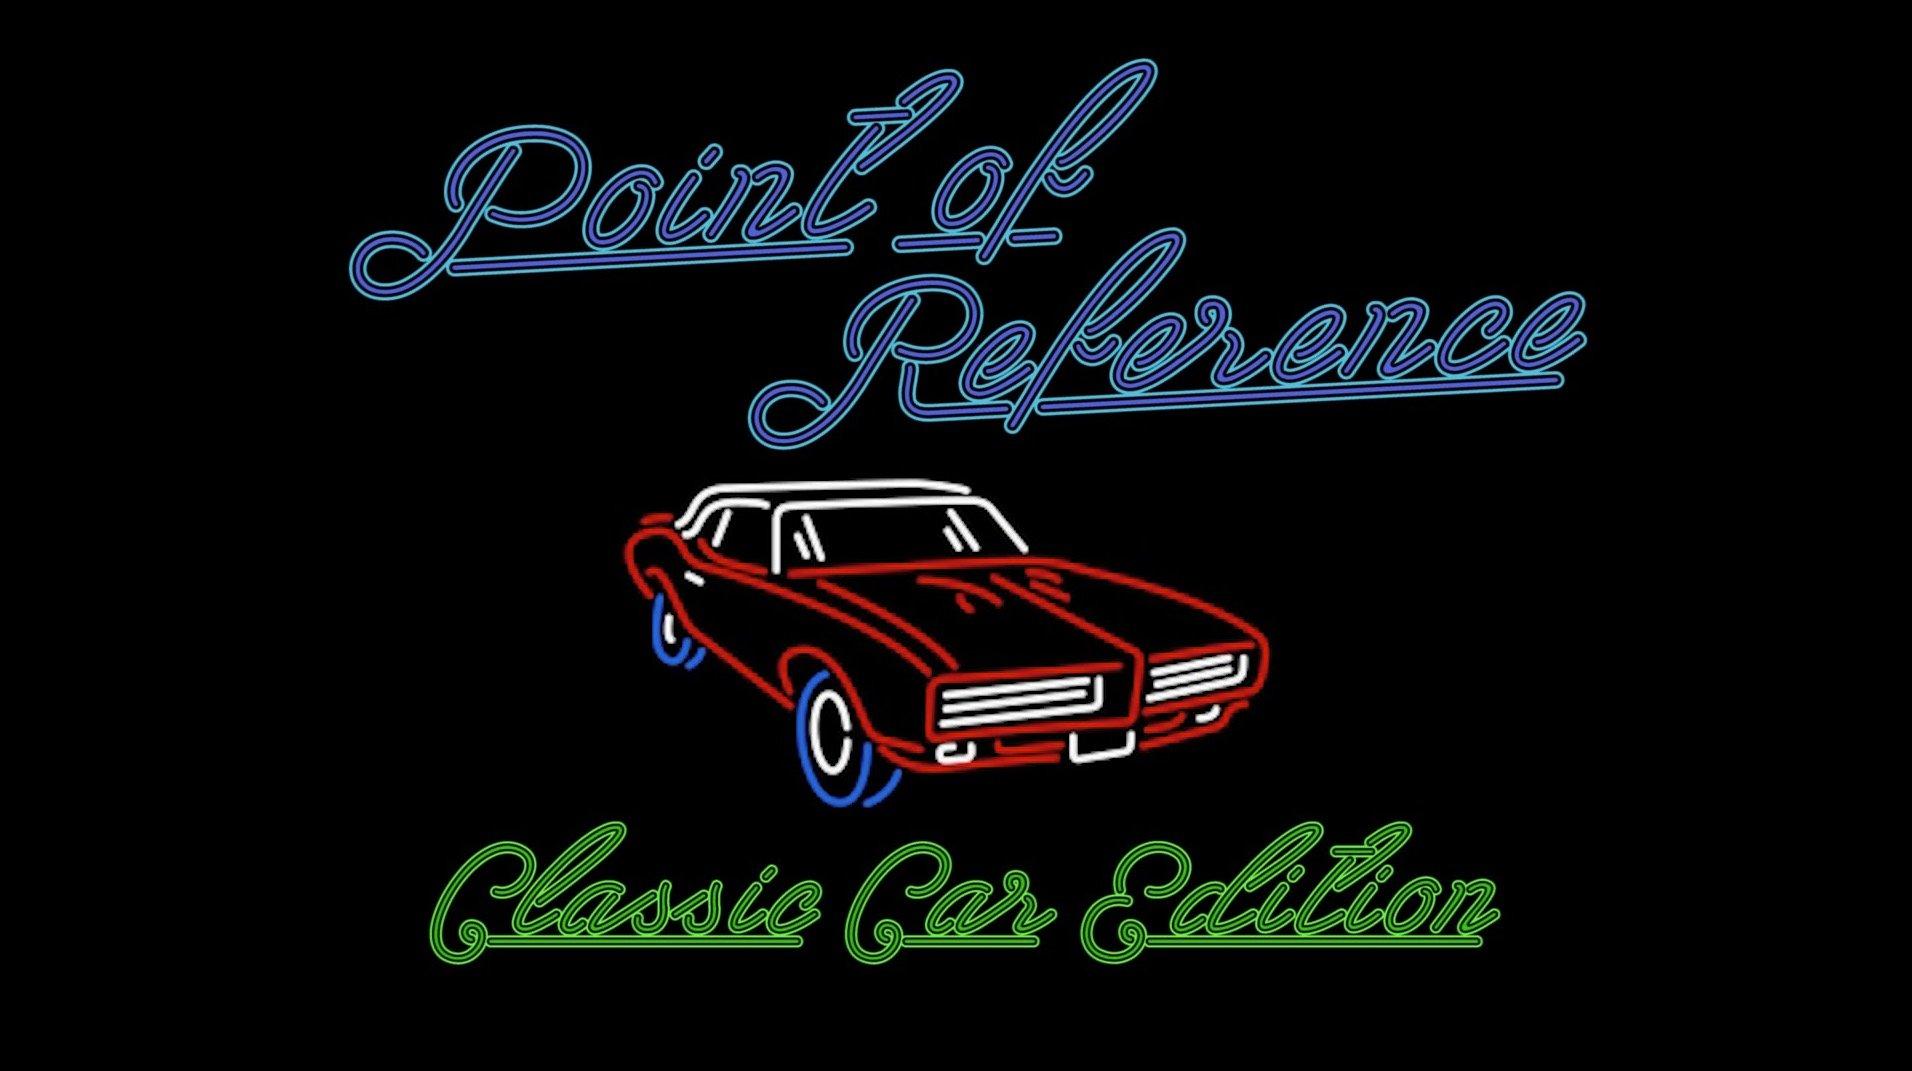 Haverhill Classic Car Show